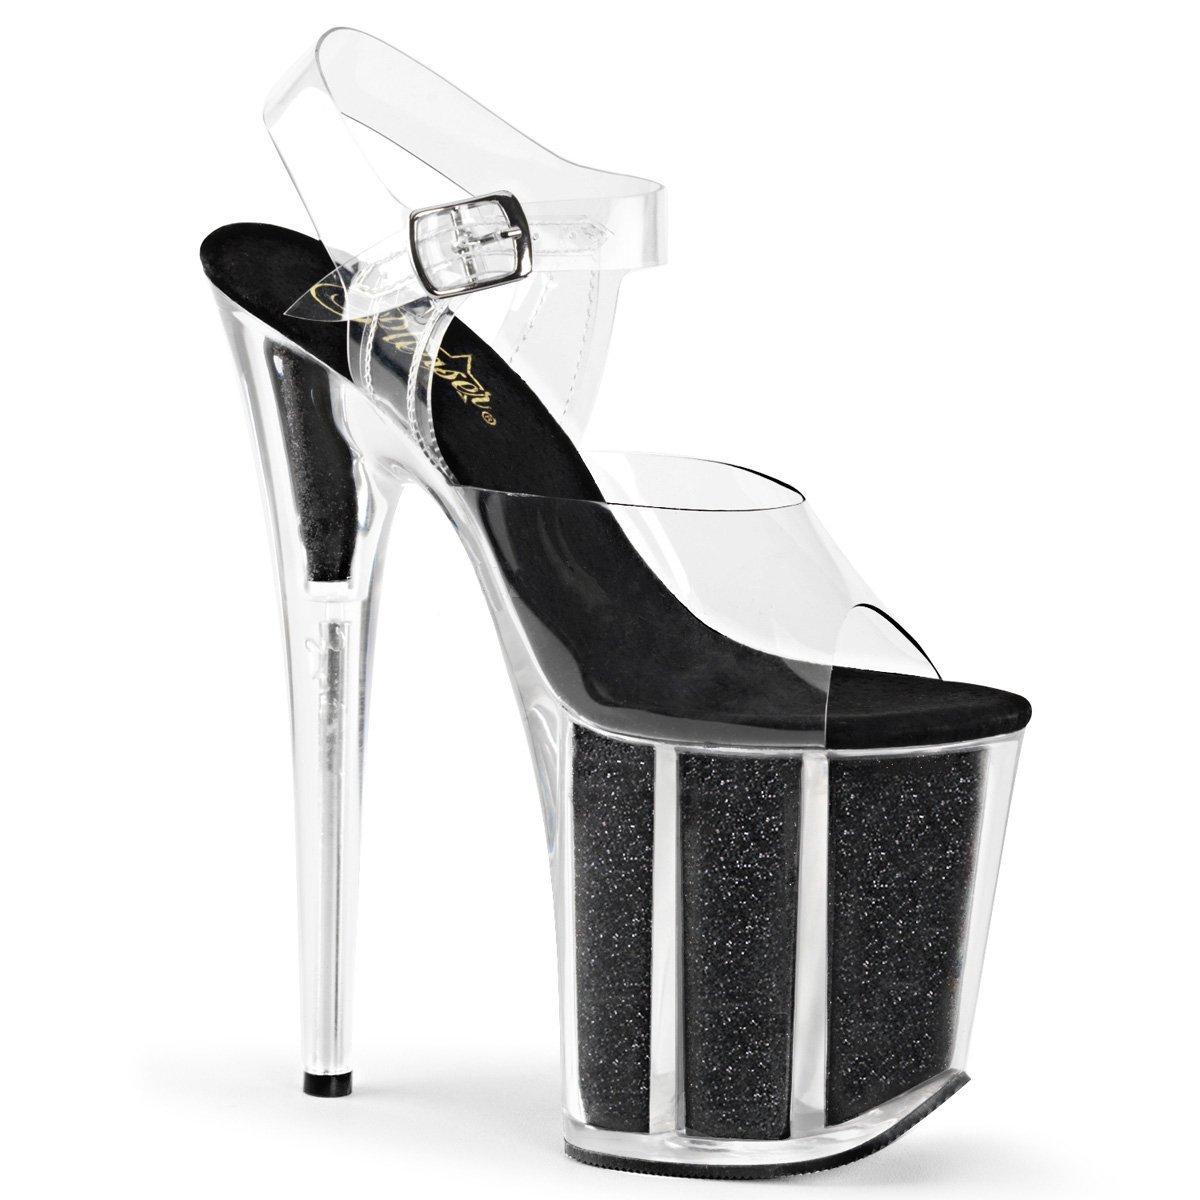 Pleaser FLAMINGO-808G Womens Sandal B017LOHQUE 12 B(M) US|Clr/Blk Gltr